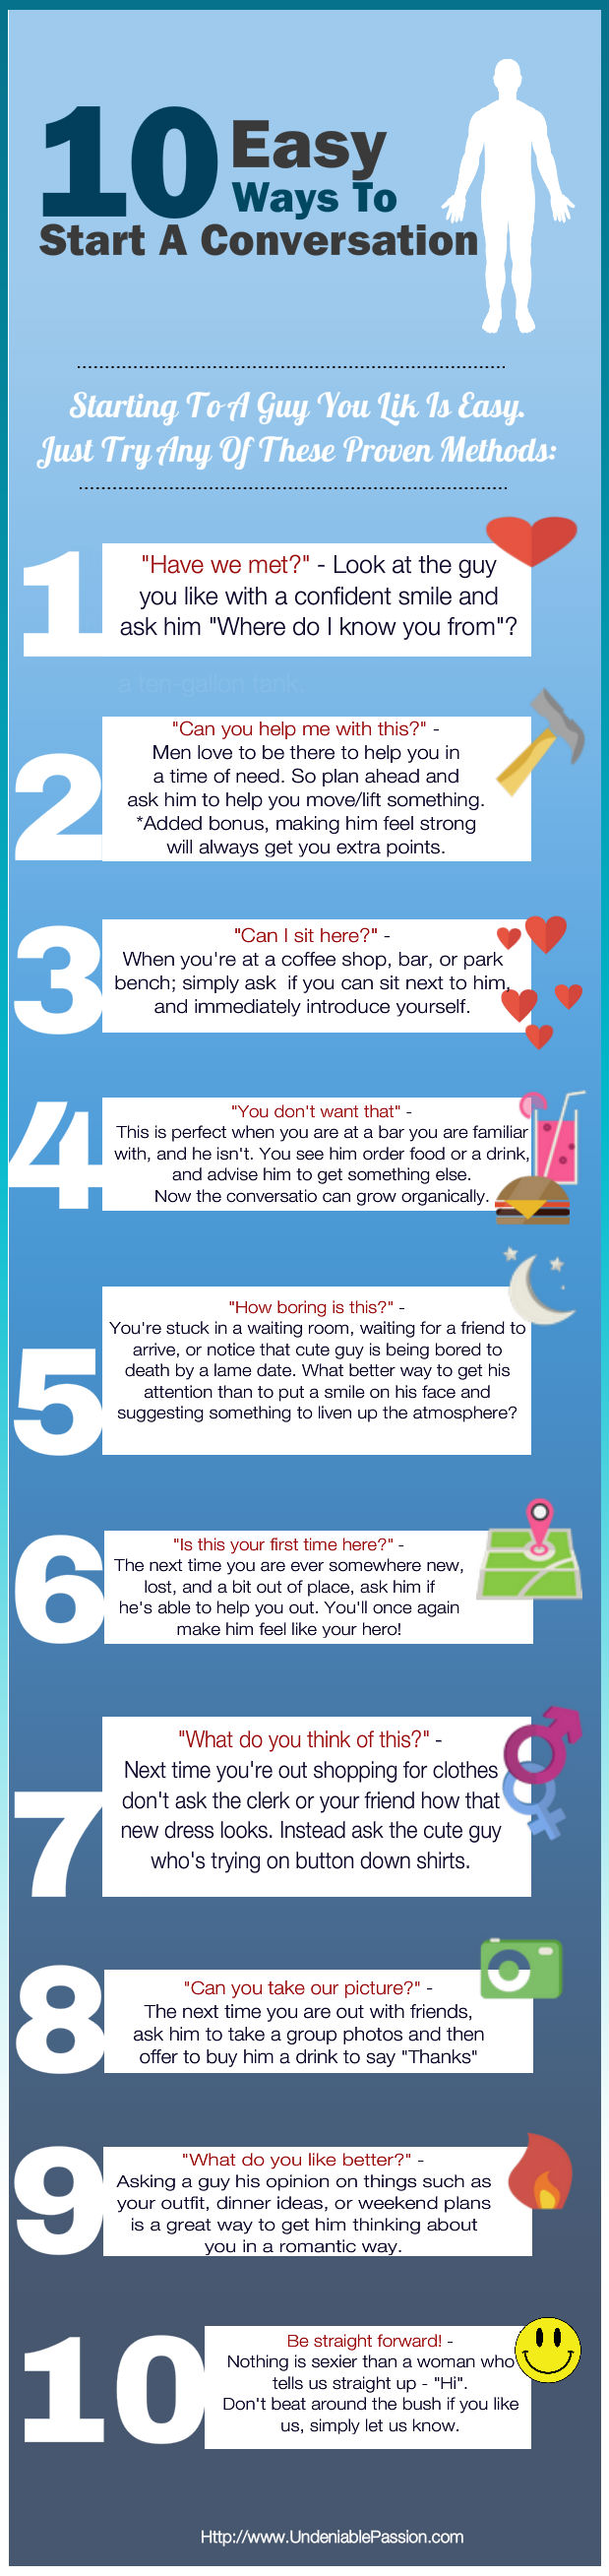 easy ways to start a conversation